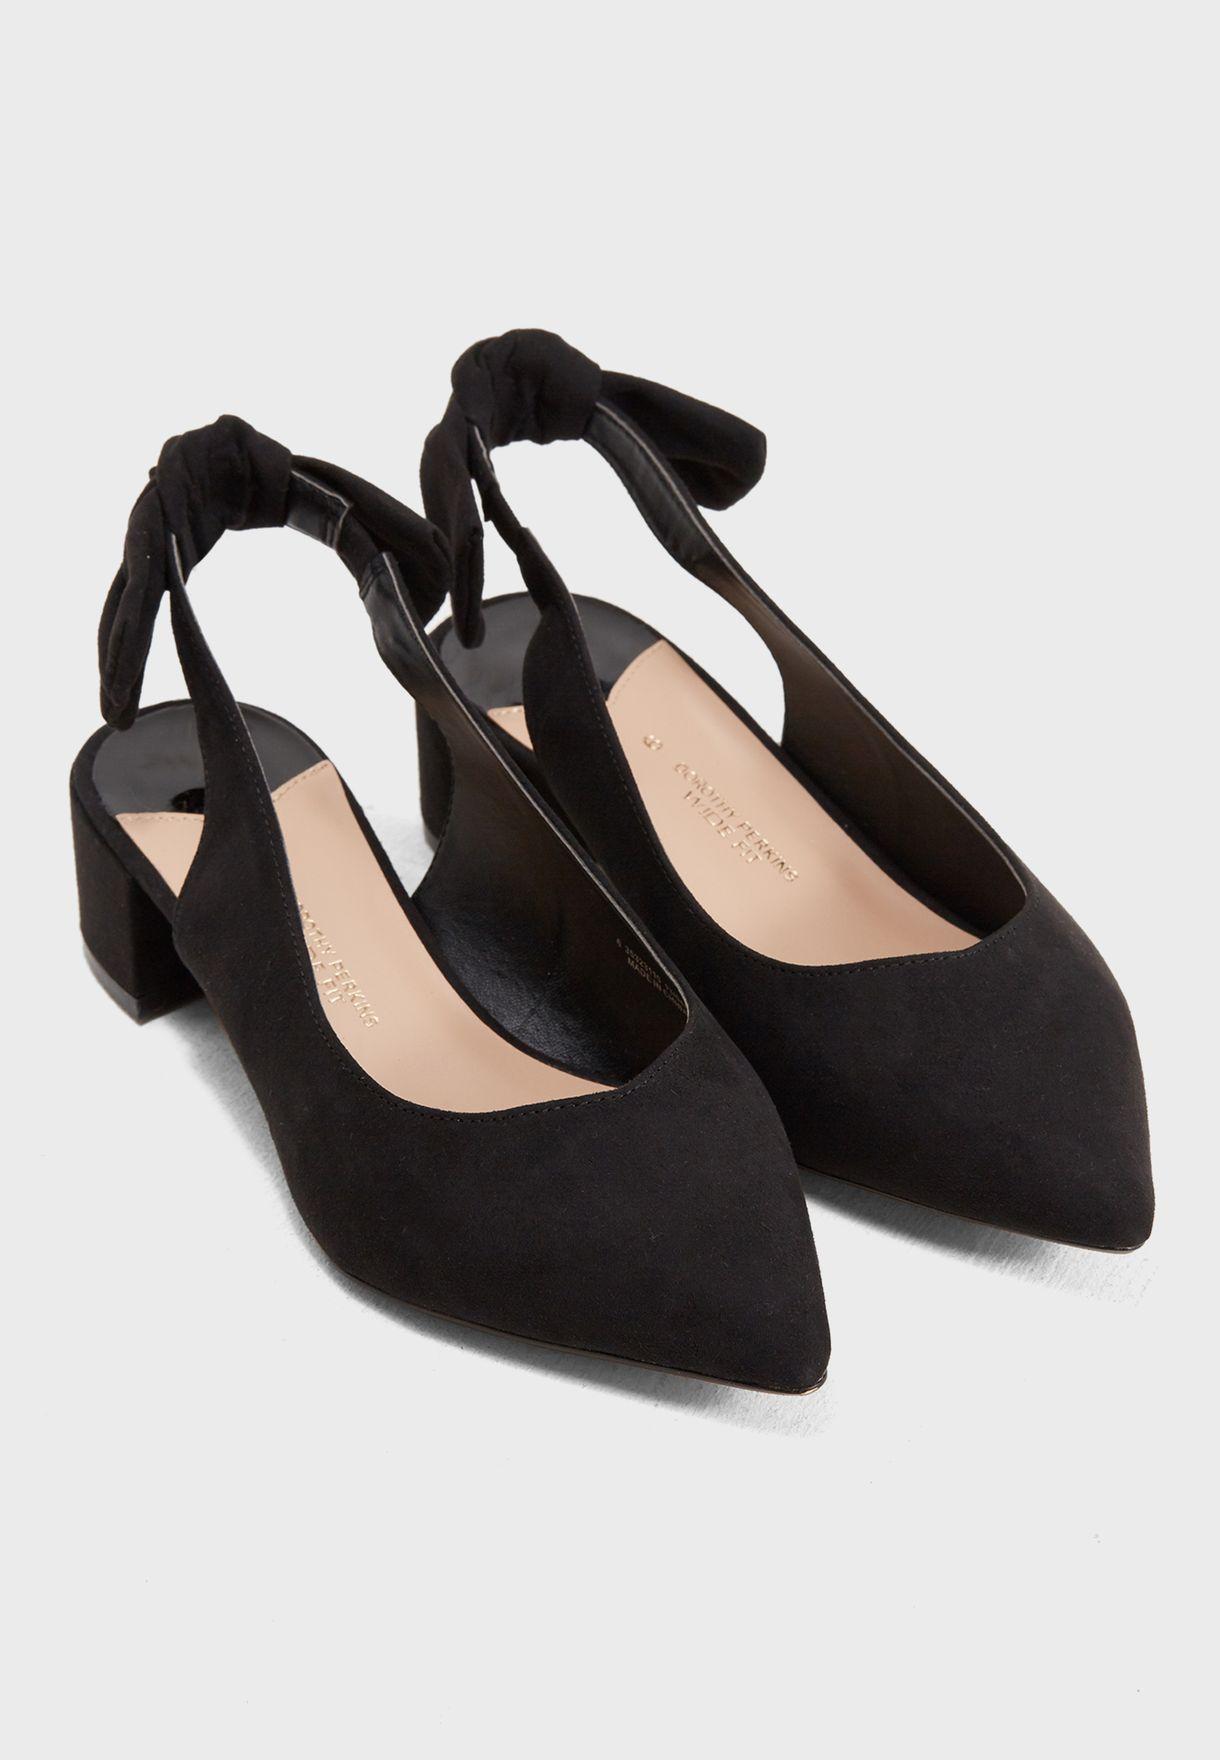 a27a4a25be9 Shop Dorothy Perkins black Microfibre Gossip Courts 35323110 for ...